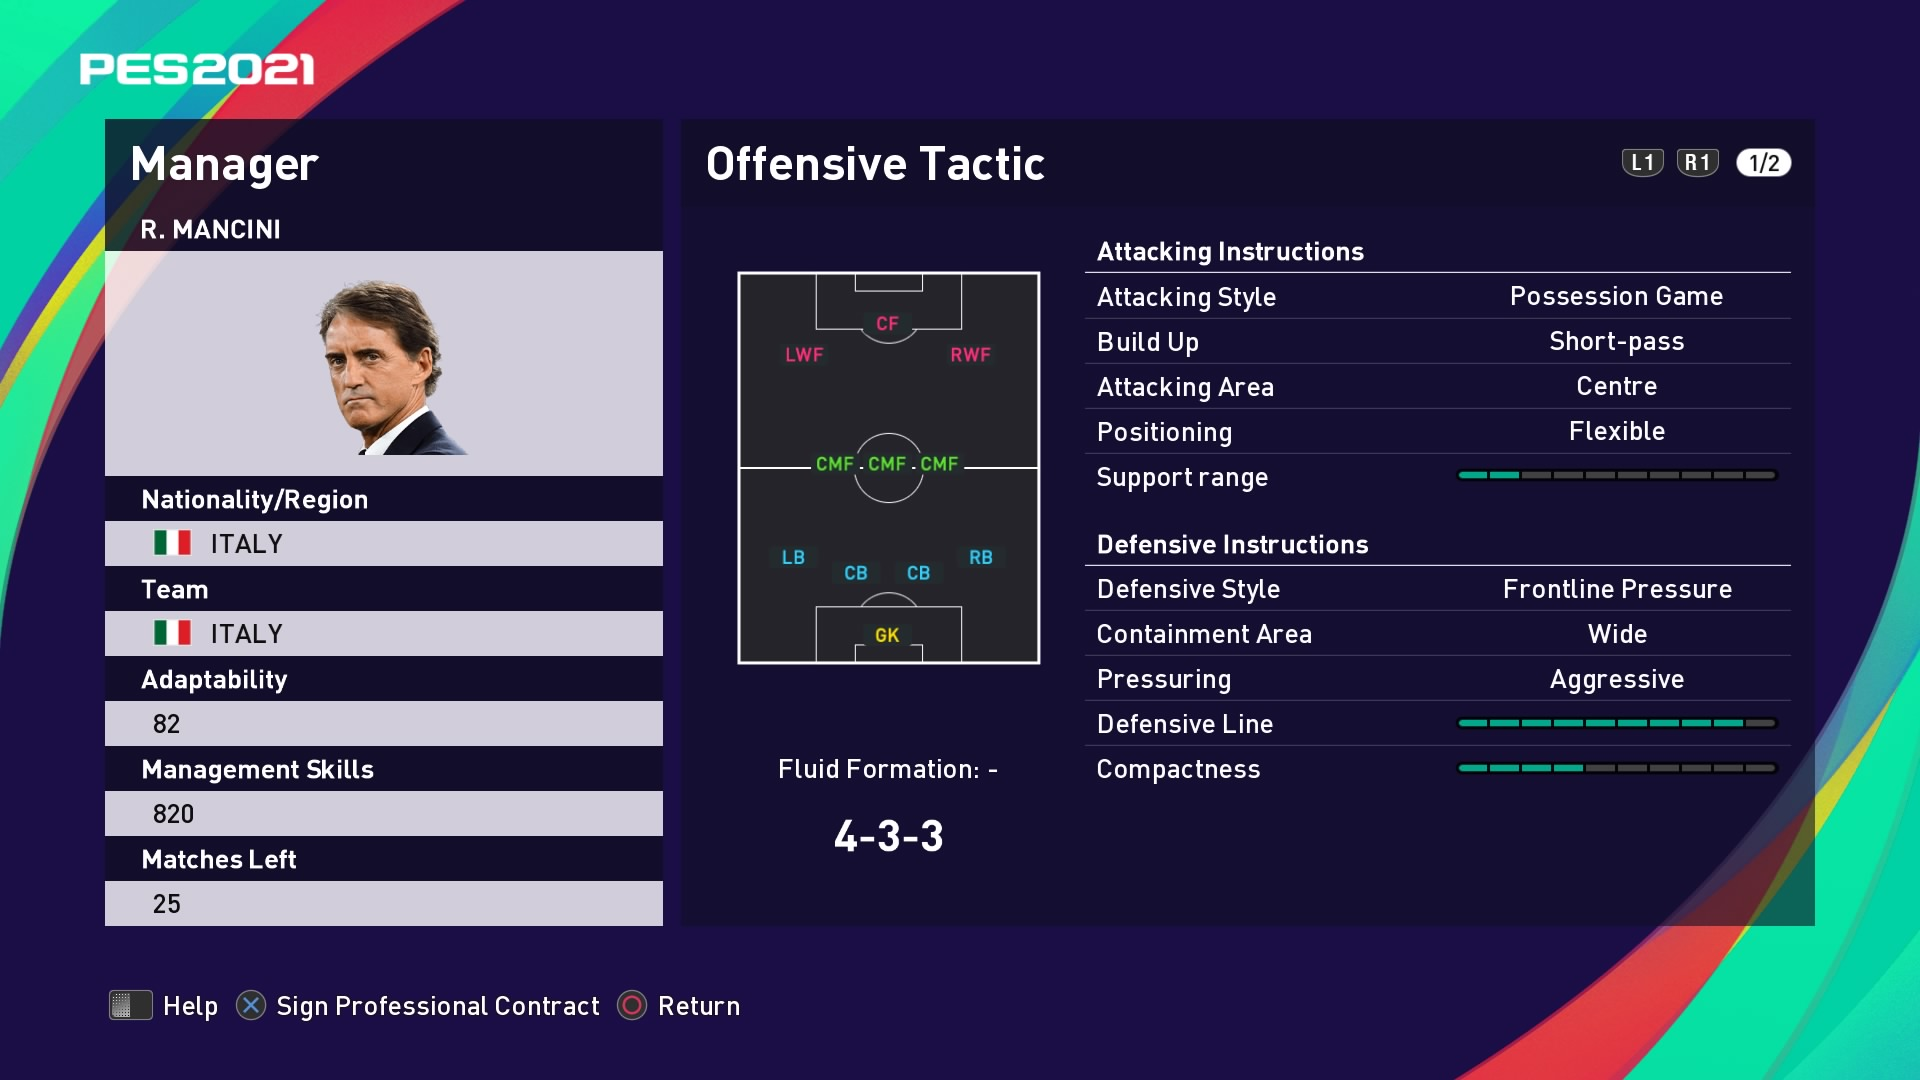 R. Mancini (Roberto Macini) Offensive Tactic in PES 2021 myClub